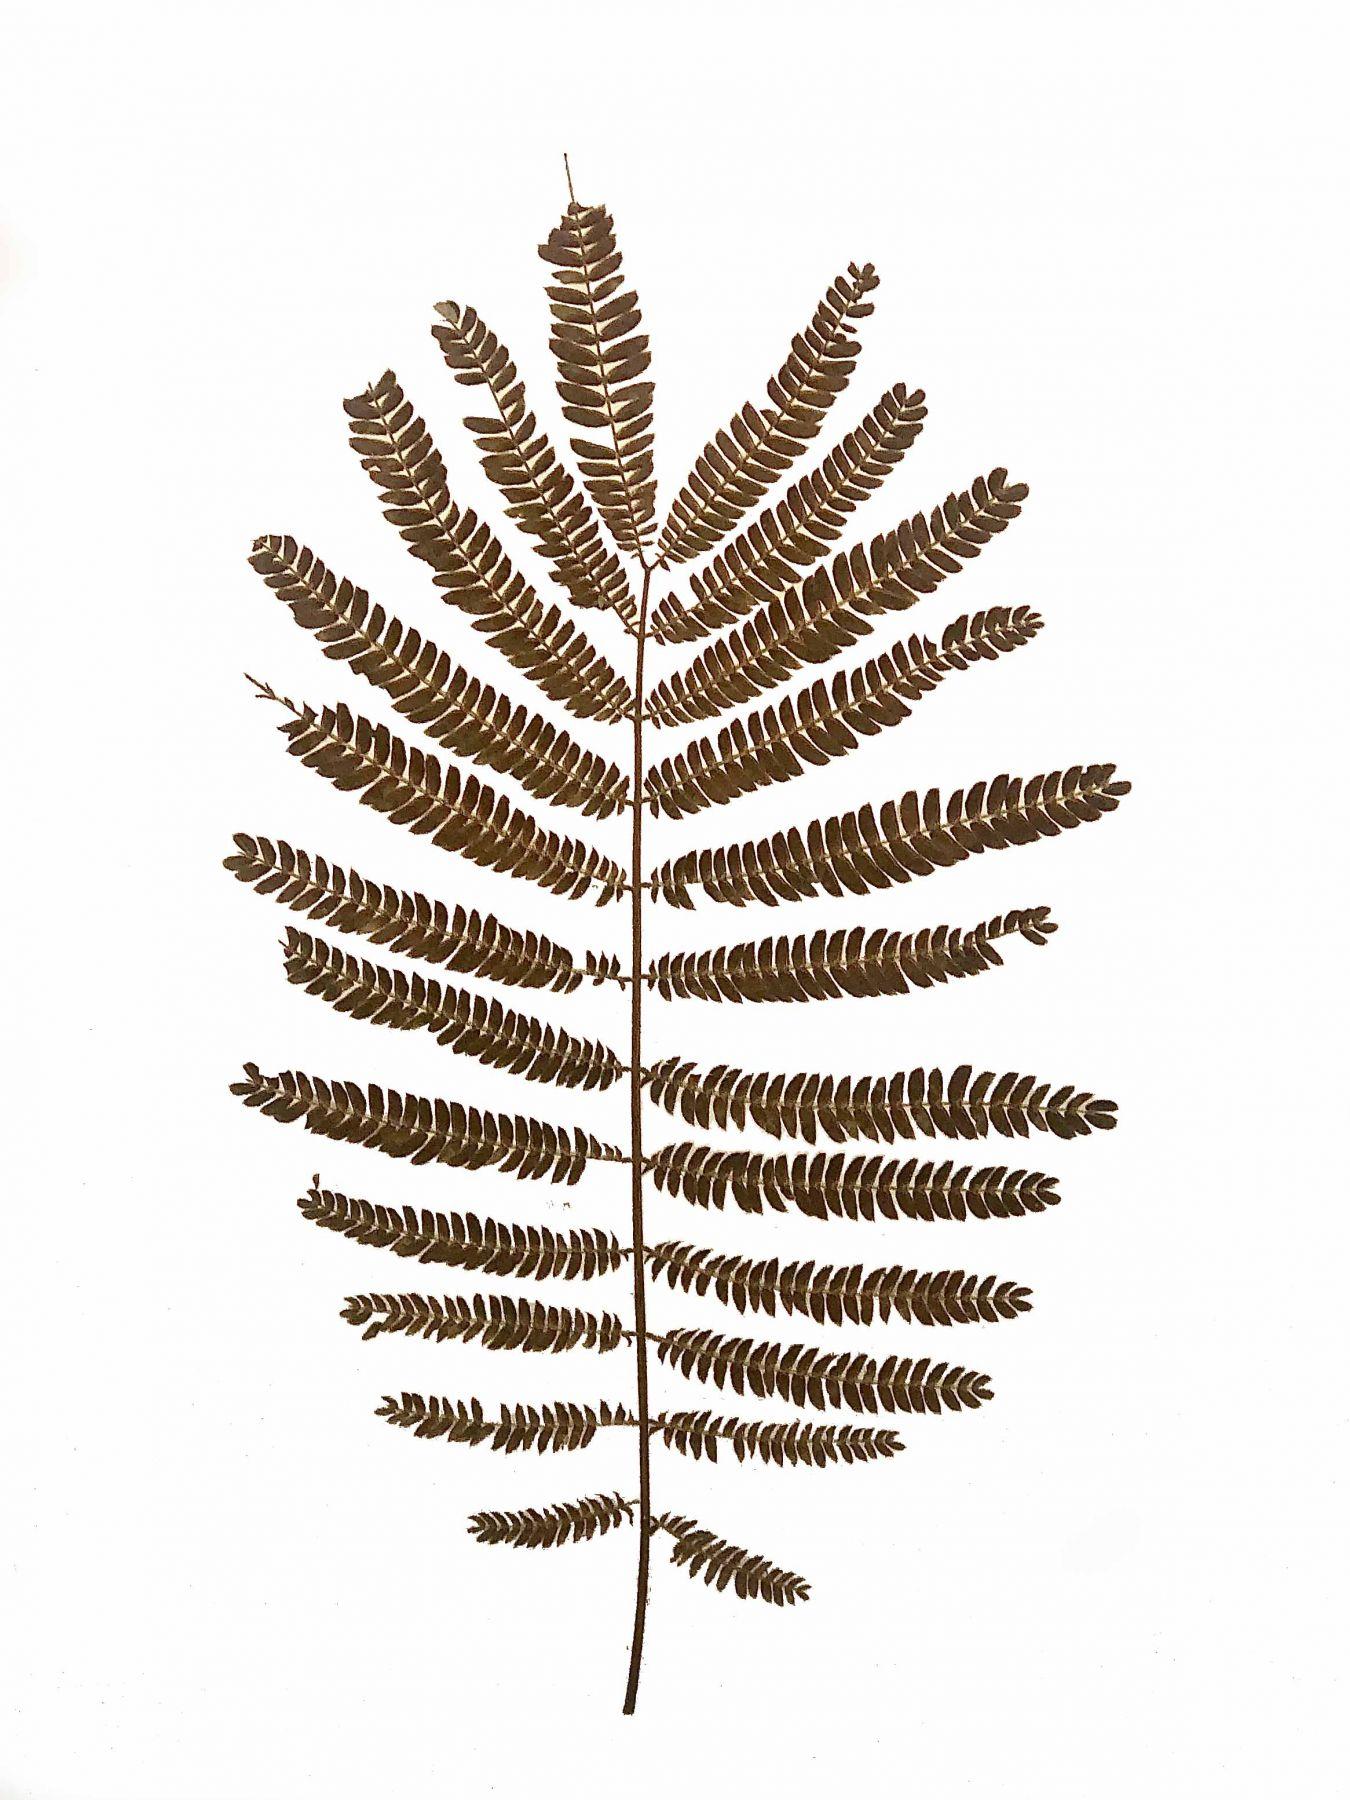 Pressed Fern, 2015, a pressed, dried fern on paper in a frame